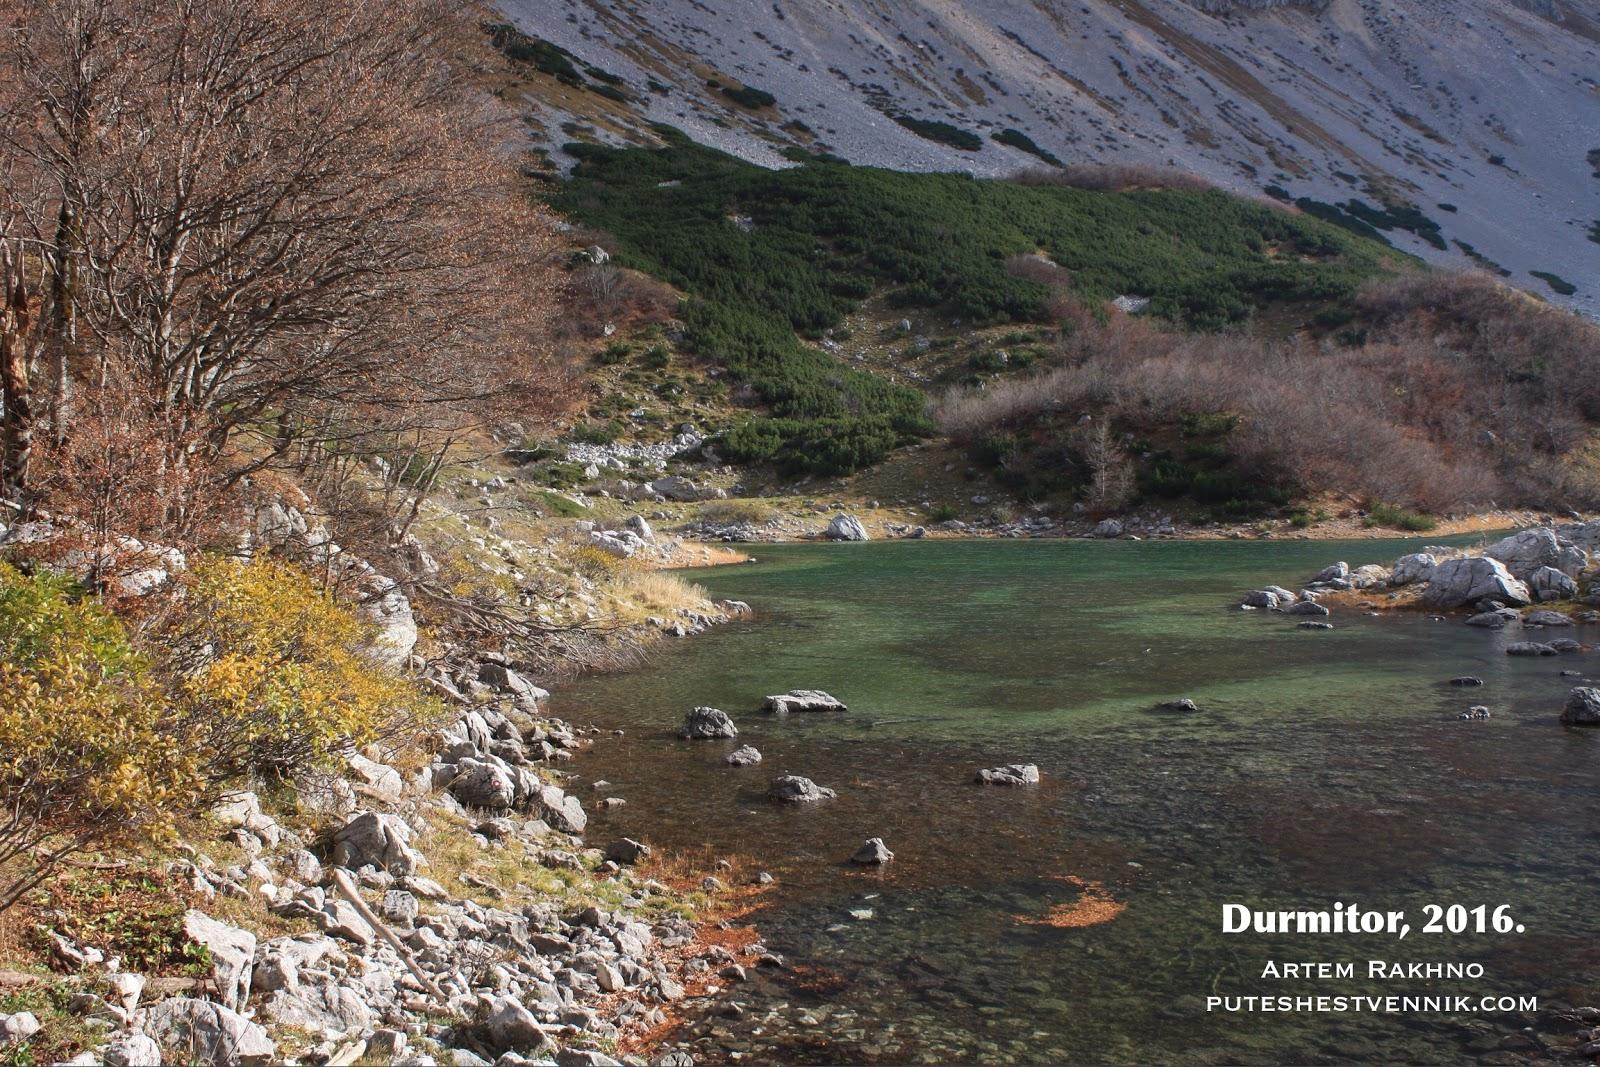 Озеро Скрчка в Дурмиторе